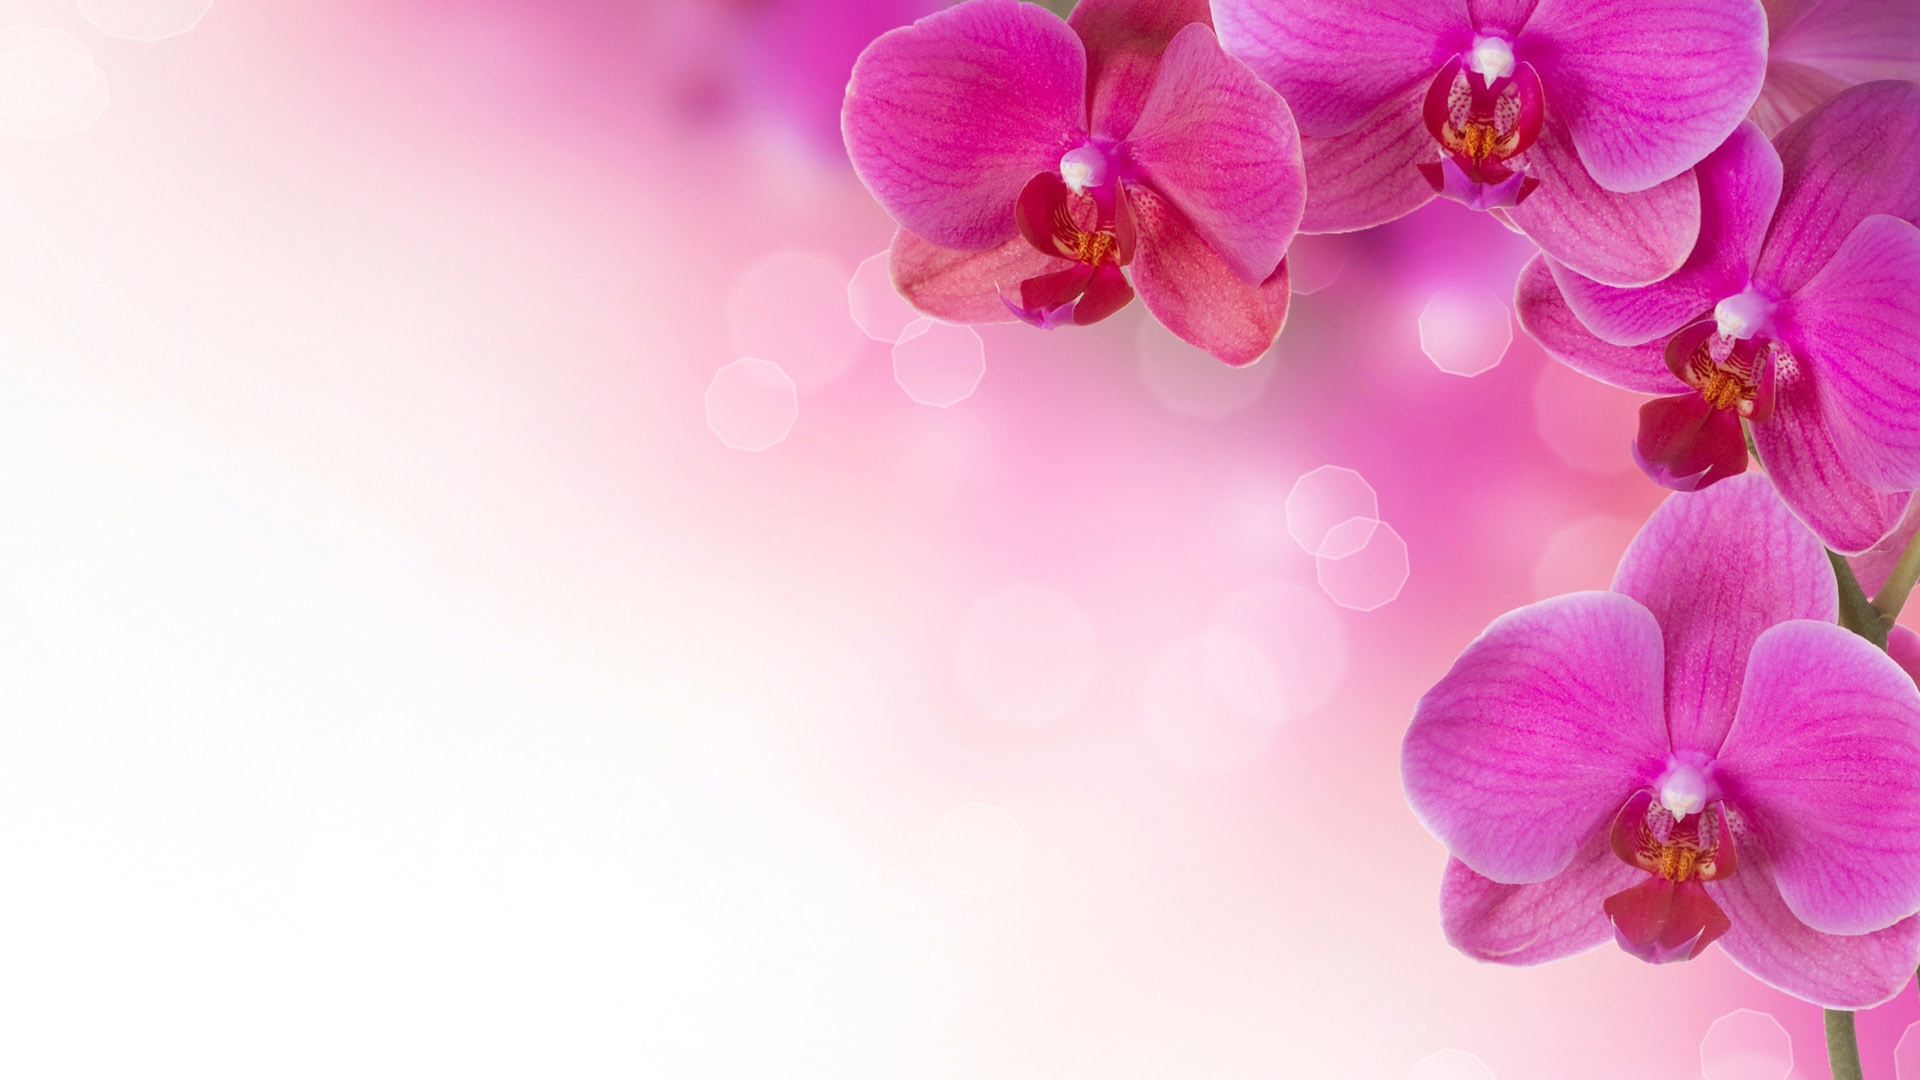 desktop hd floral wallpaper pink